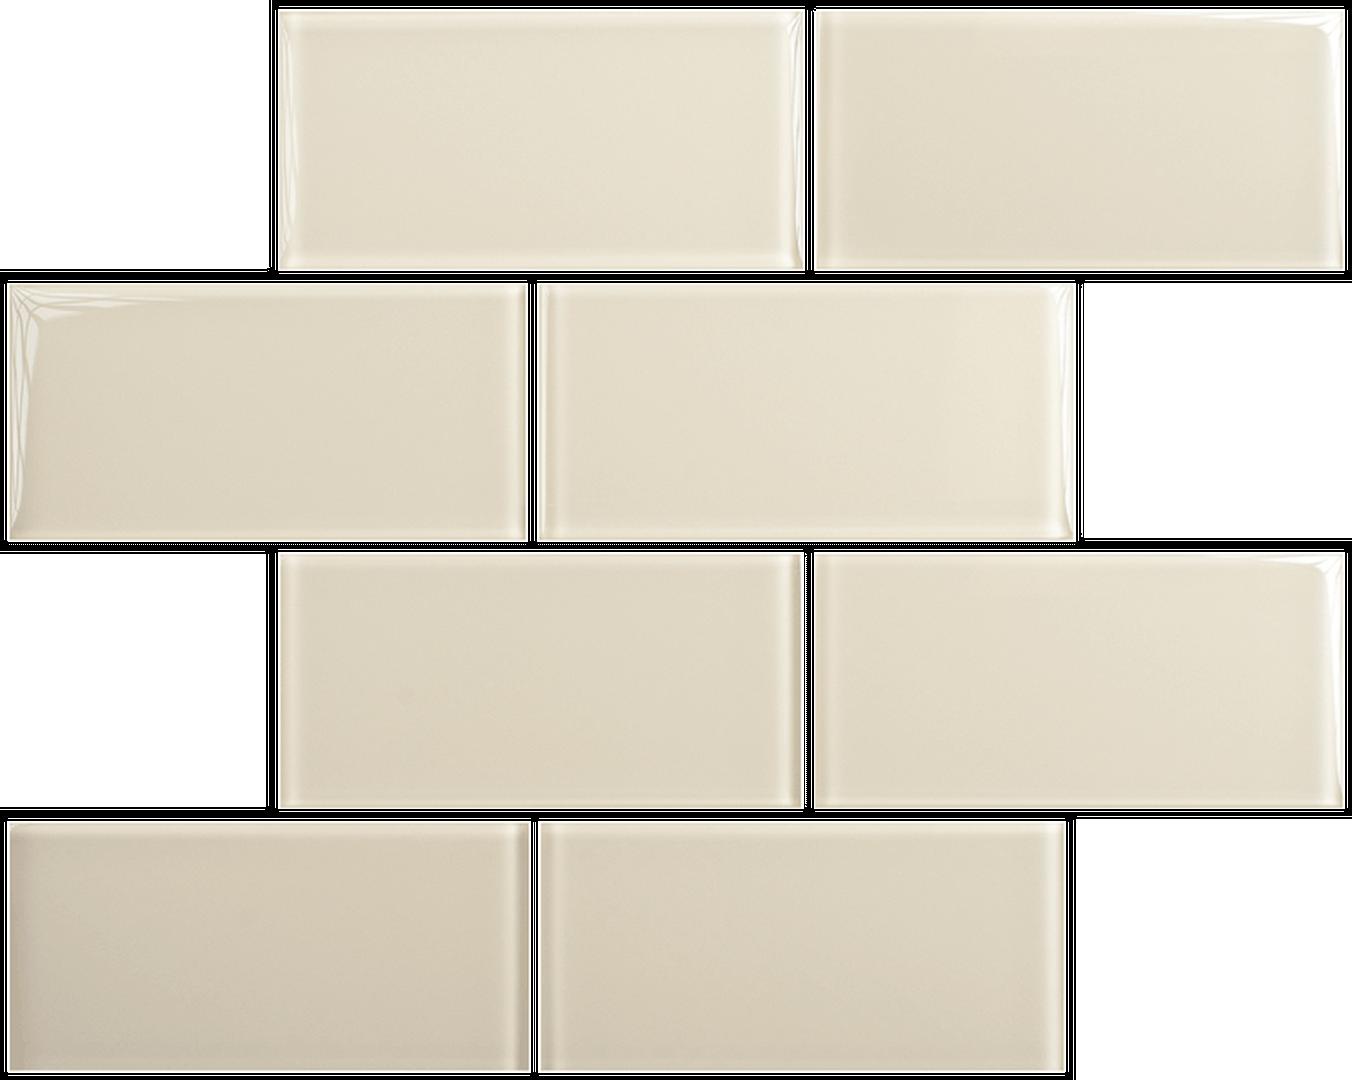 Ivory glass subway tile